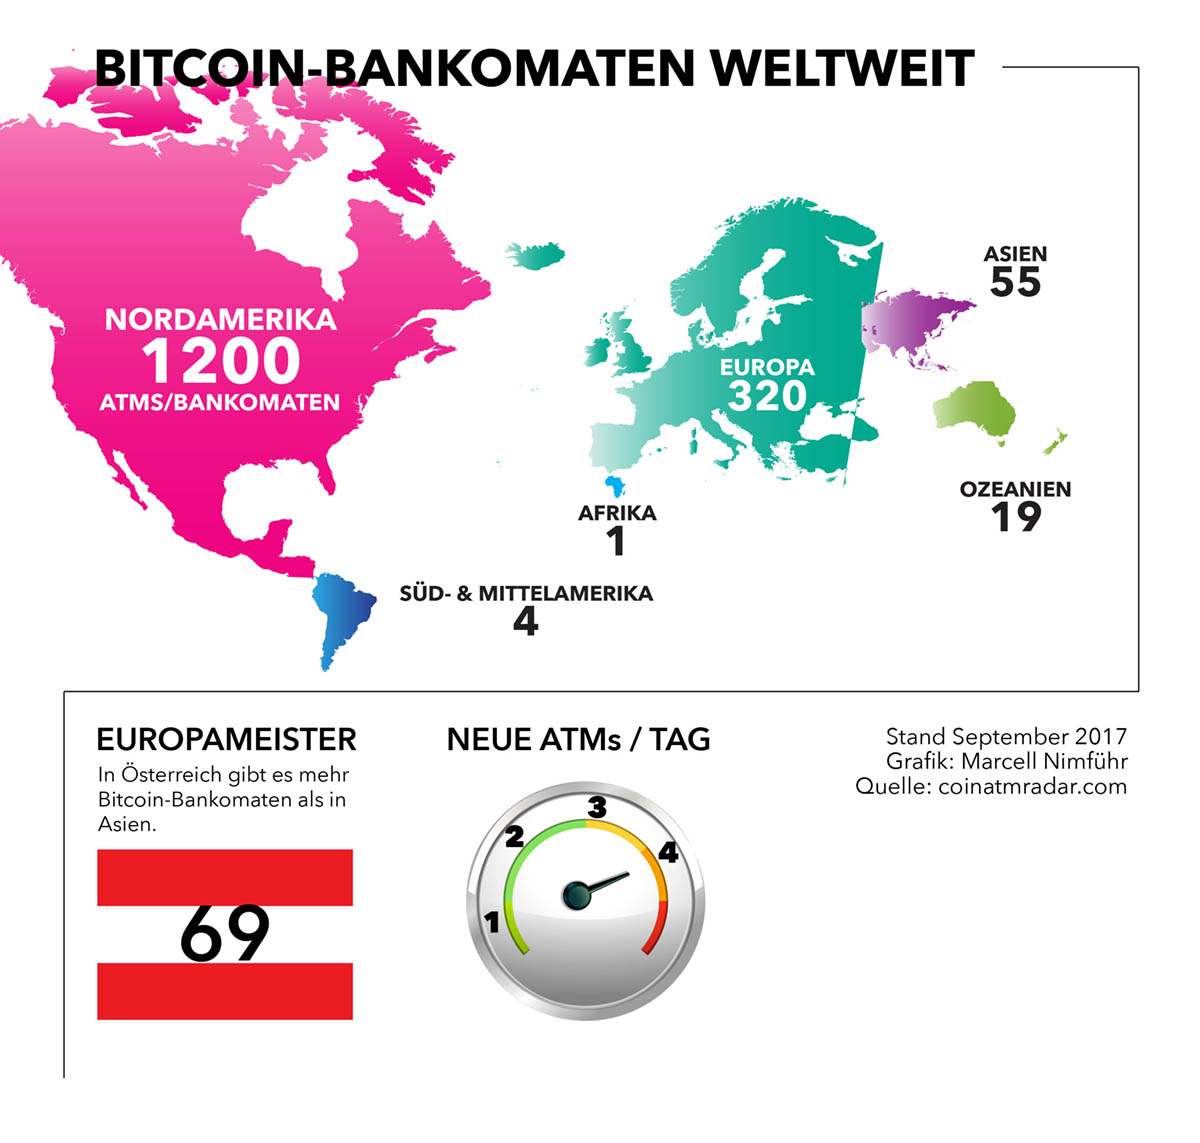 Bitcoin Bankomaten weltweit - Infografik